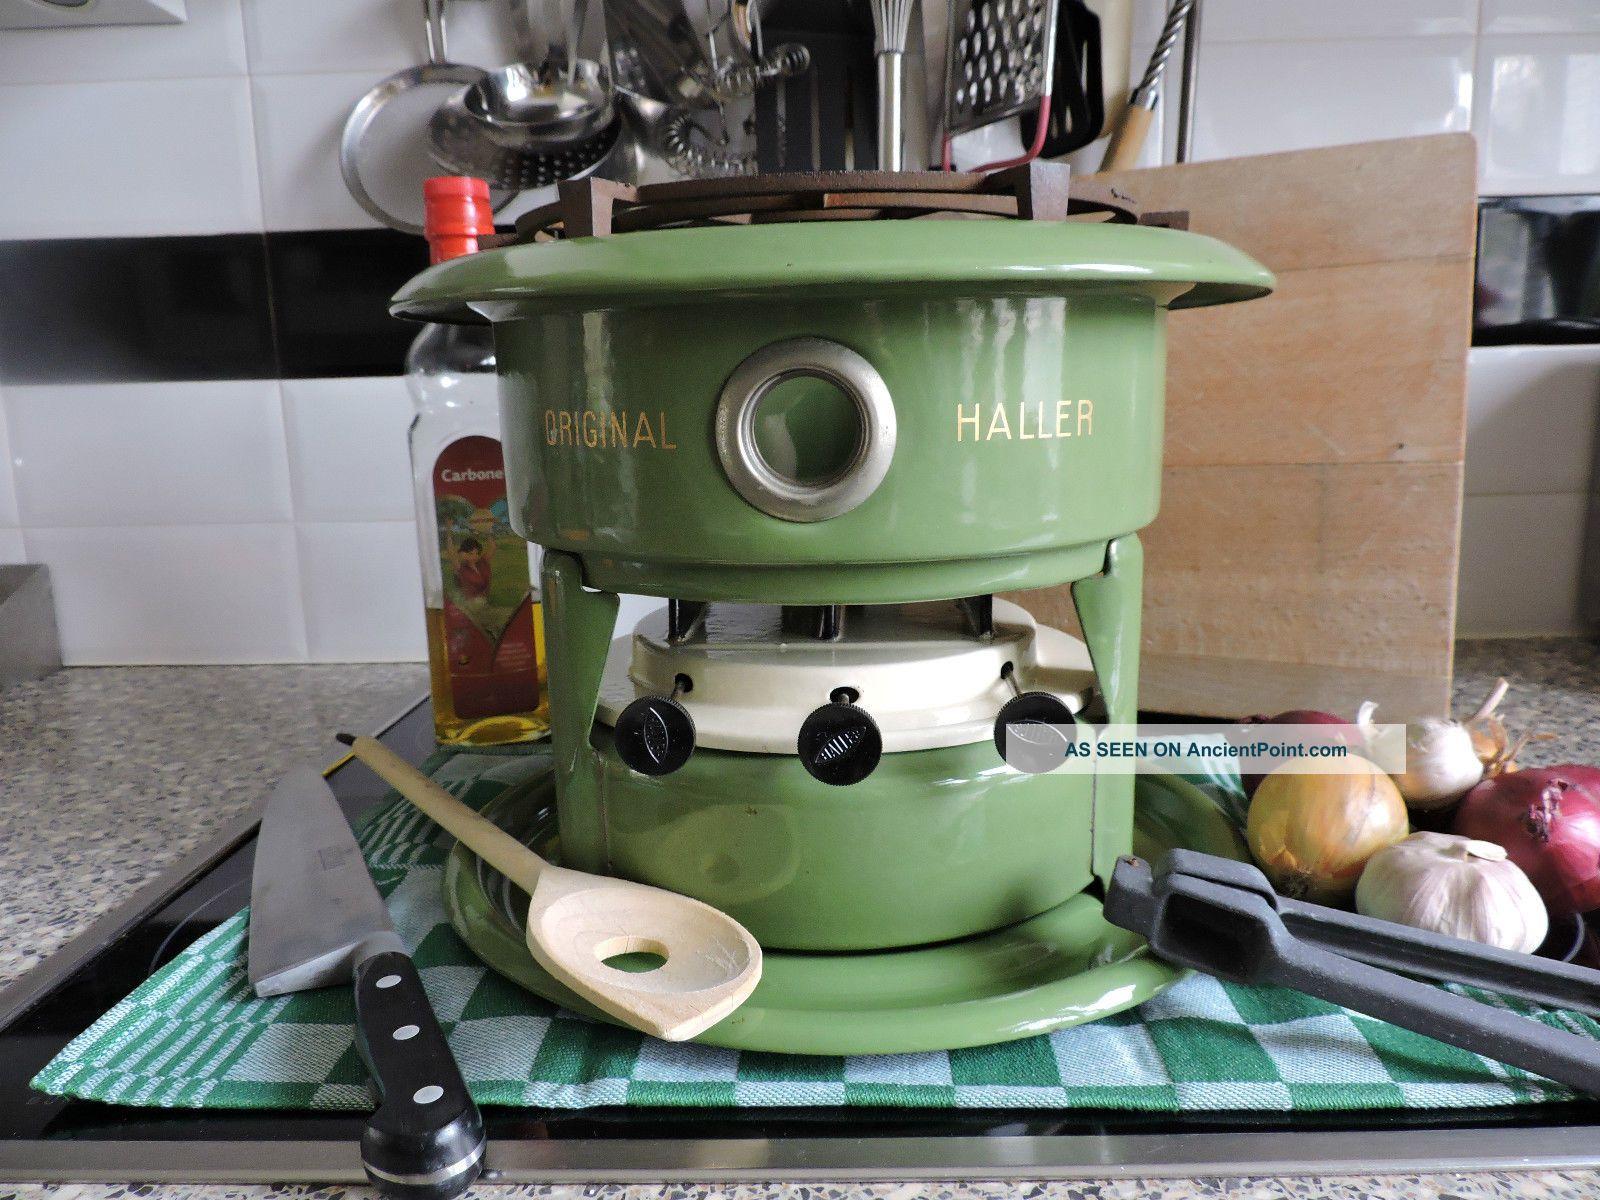 Enamel Large Green Vintage Haller Kerosene Stove Slow Cooker 3 Wicks Burner Stoves photo